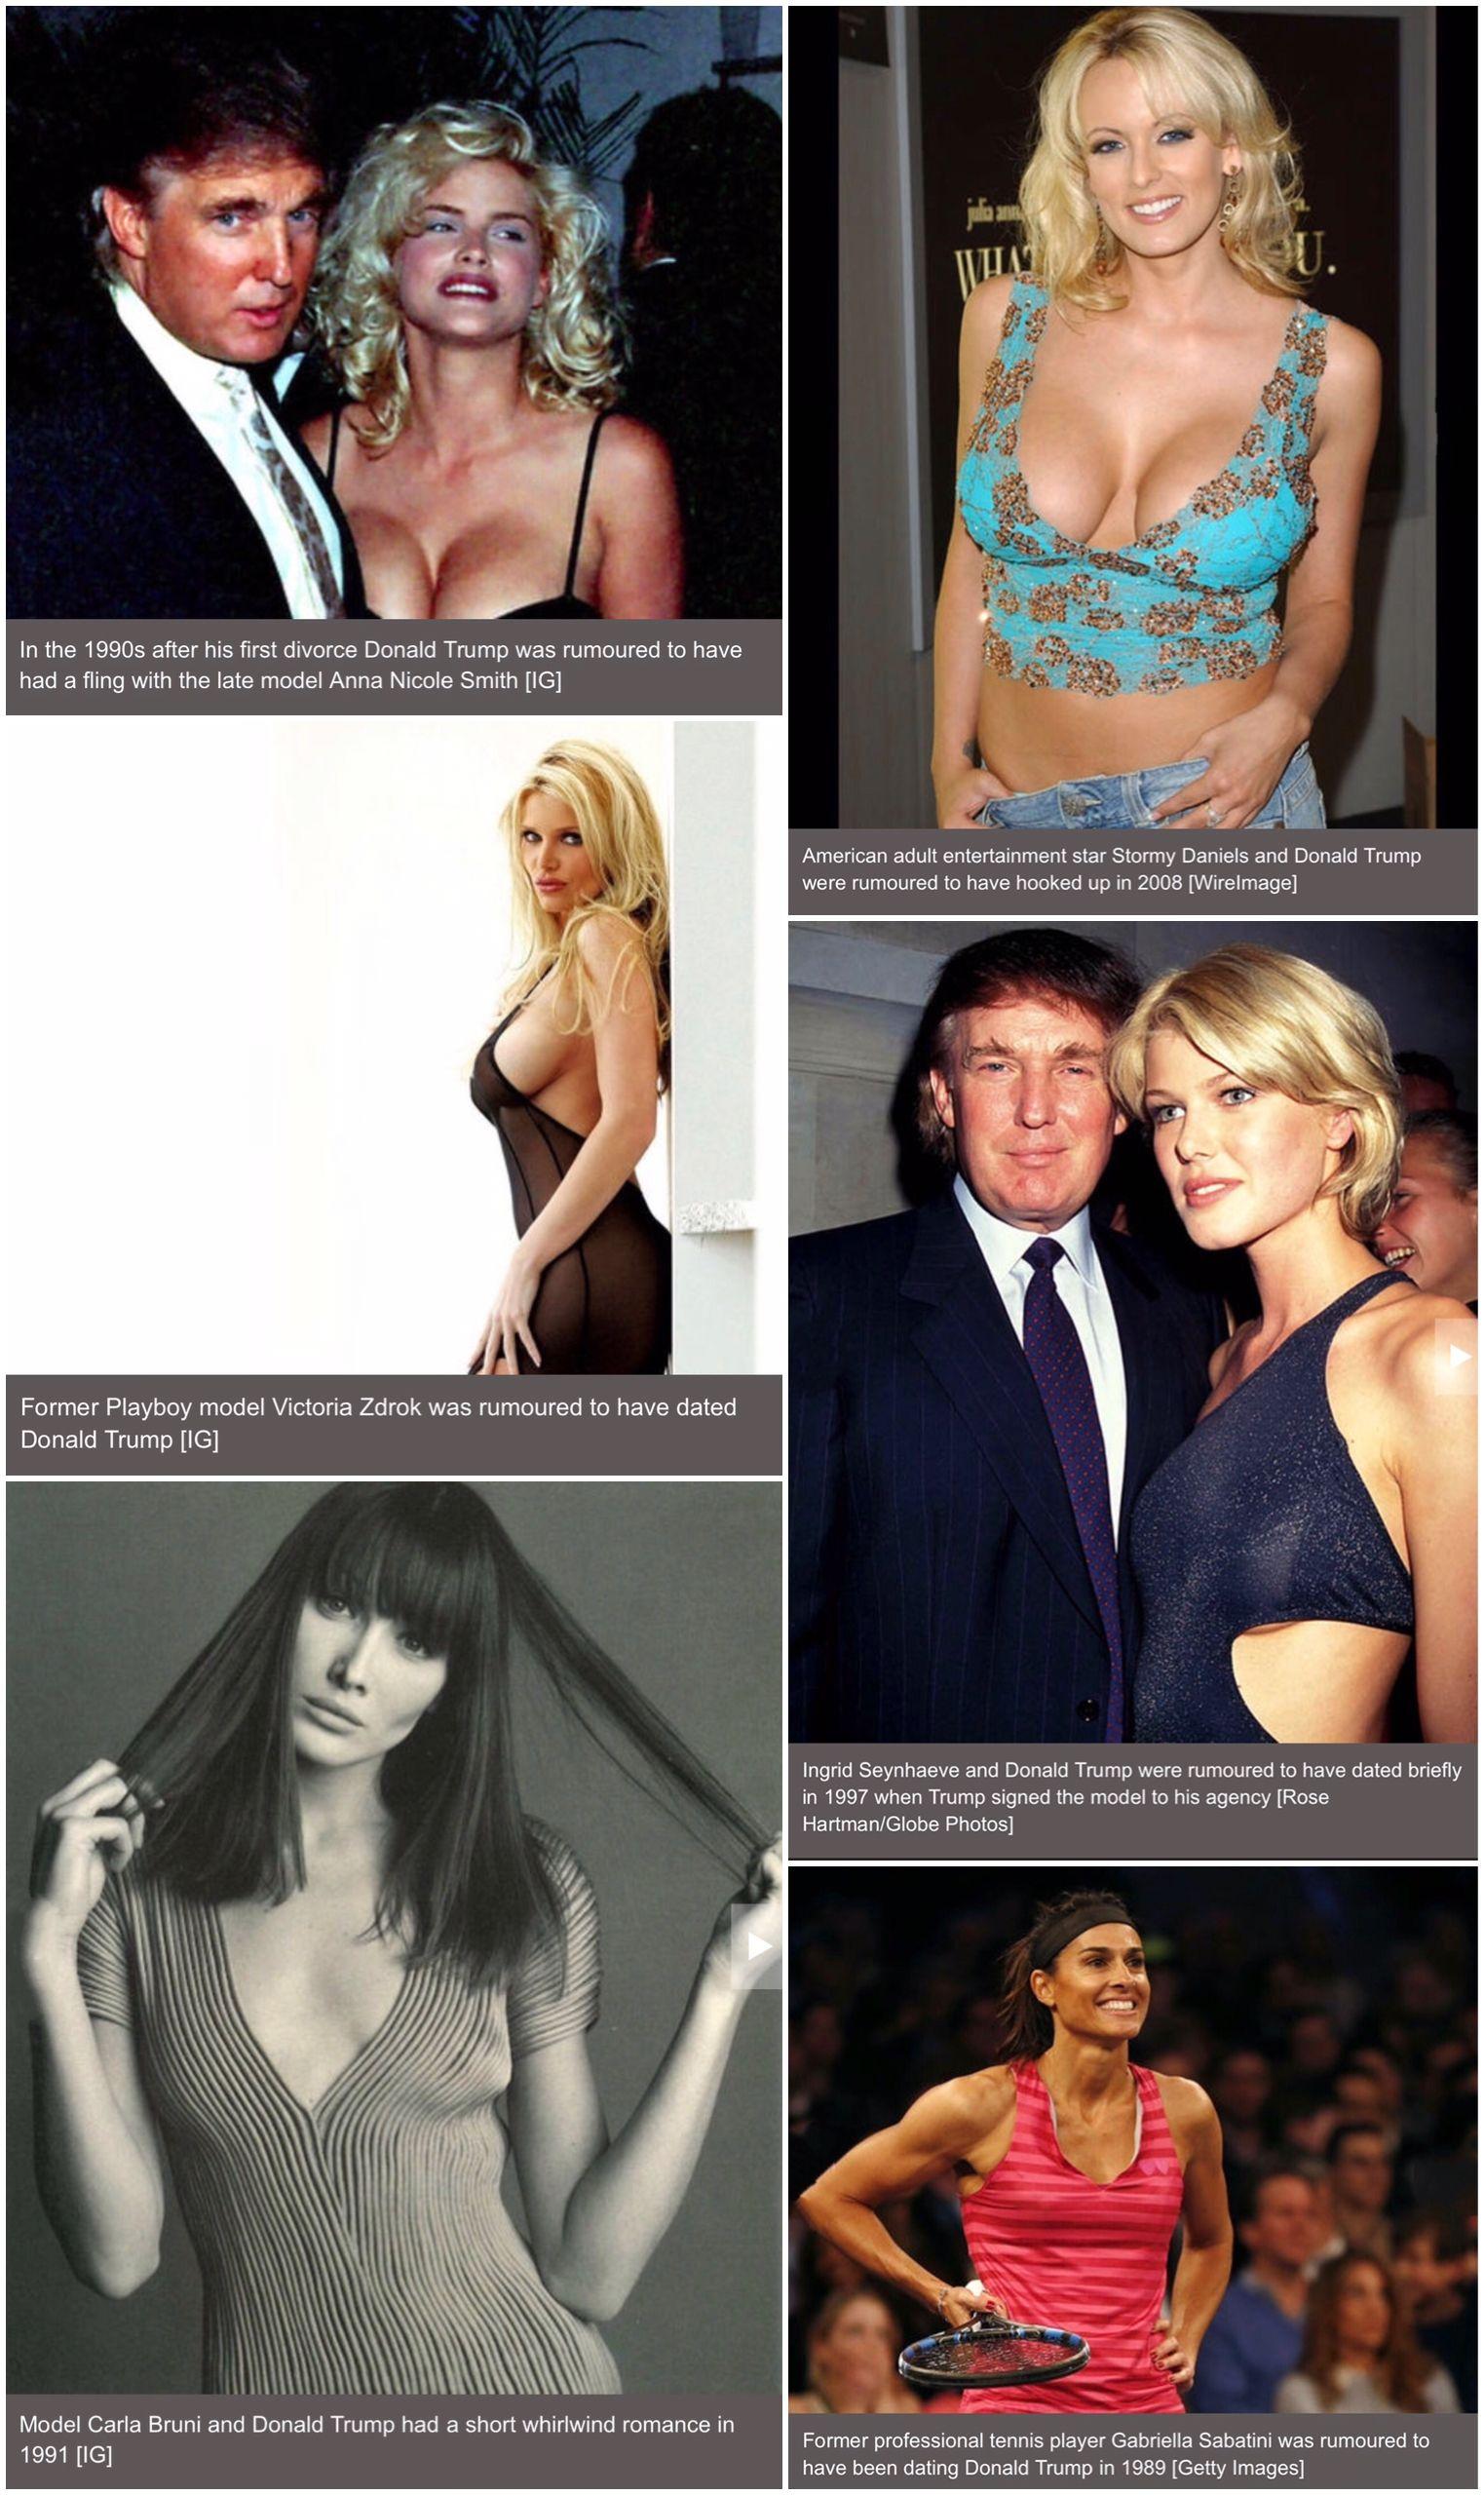 Смотреть красивое порно от х арт фото